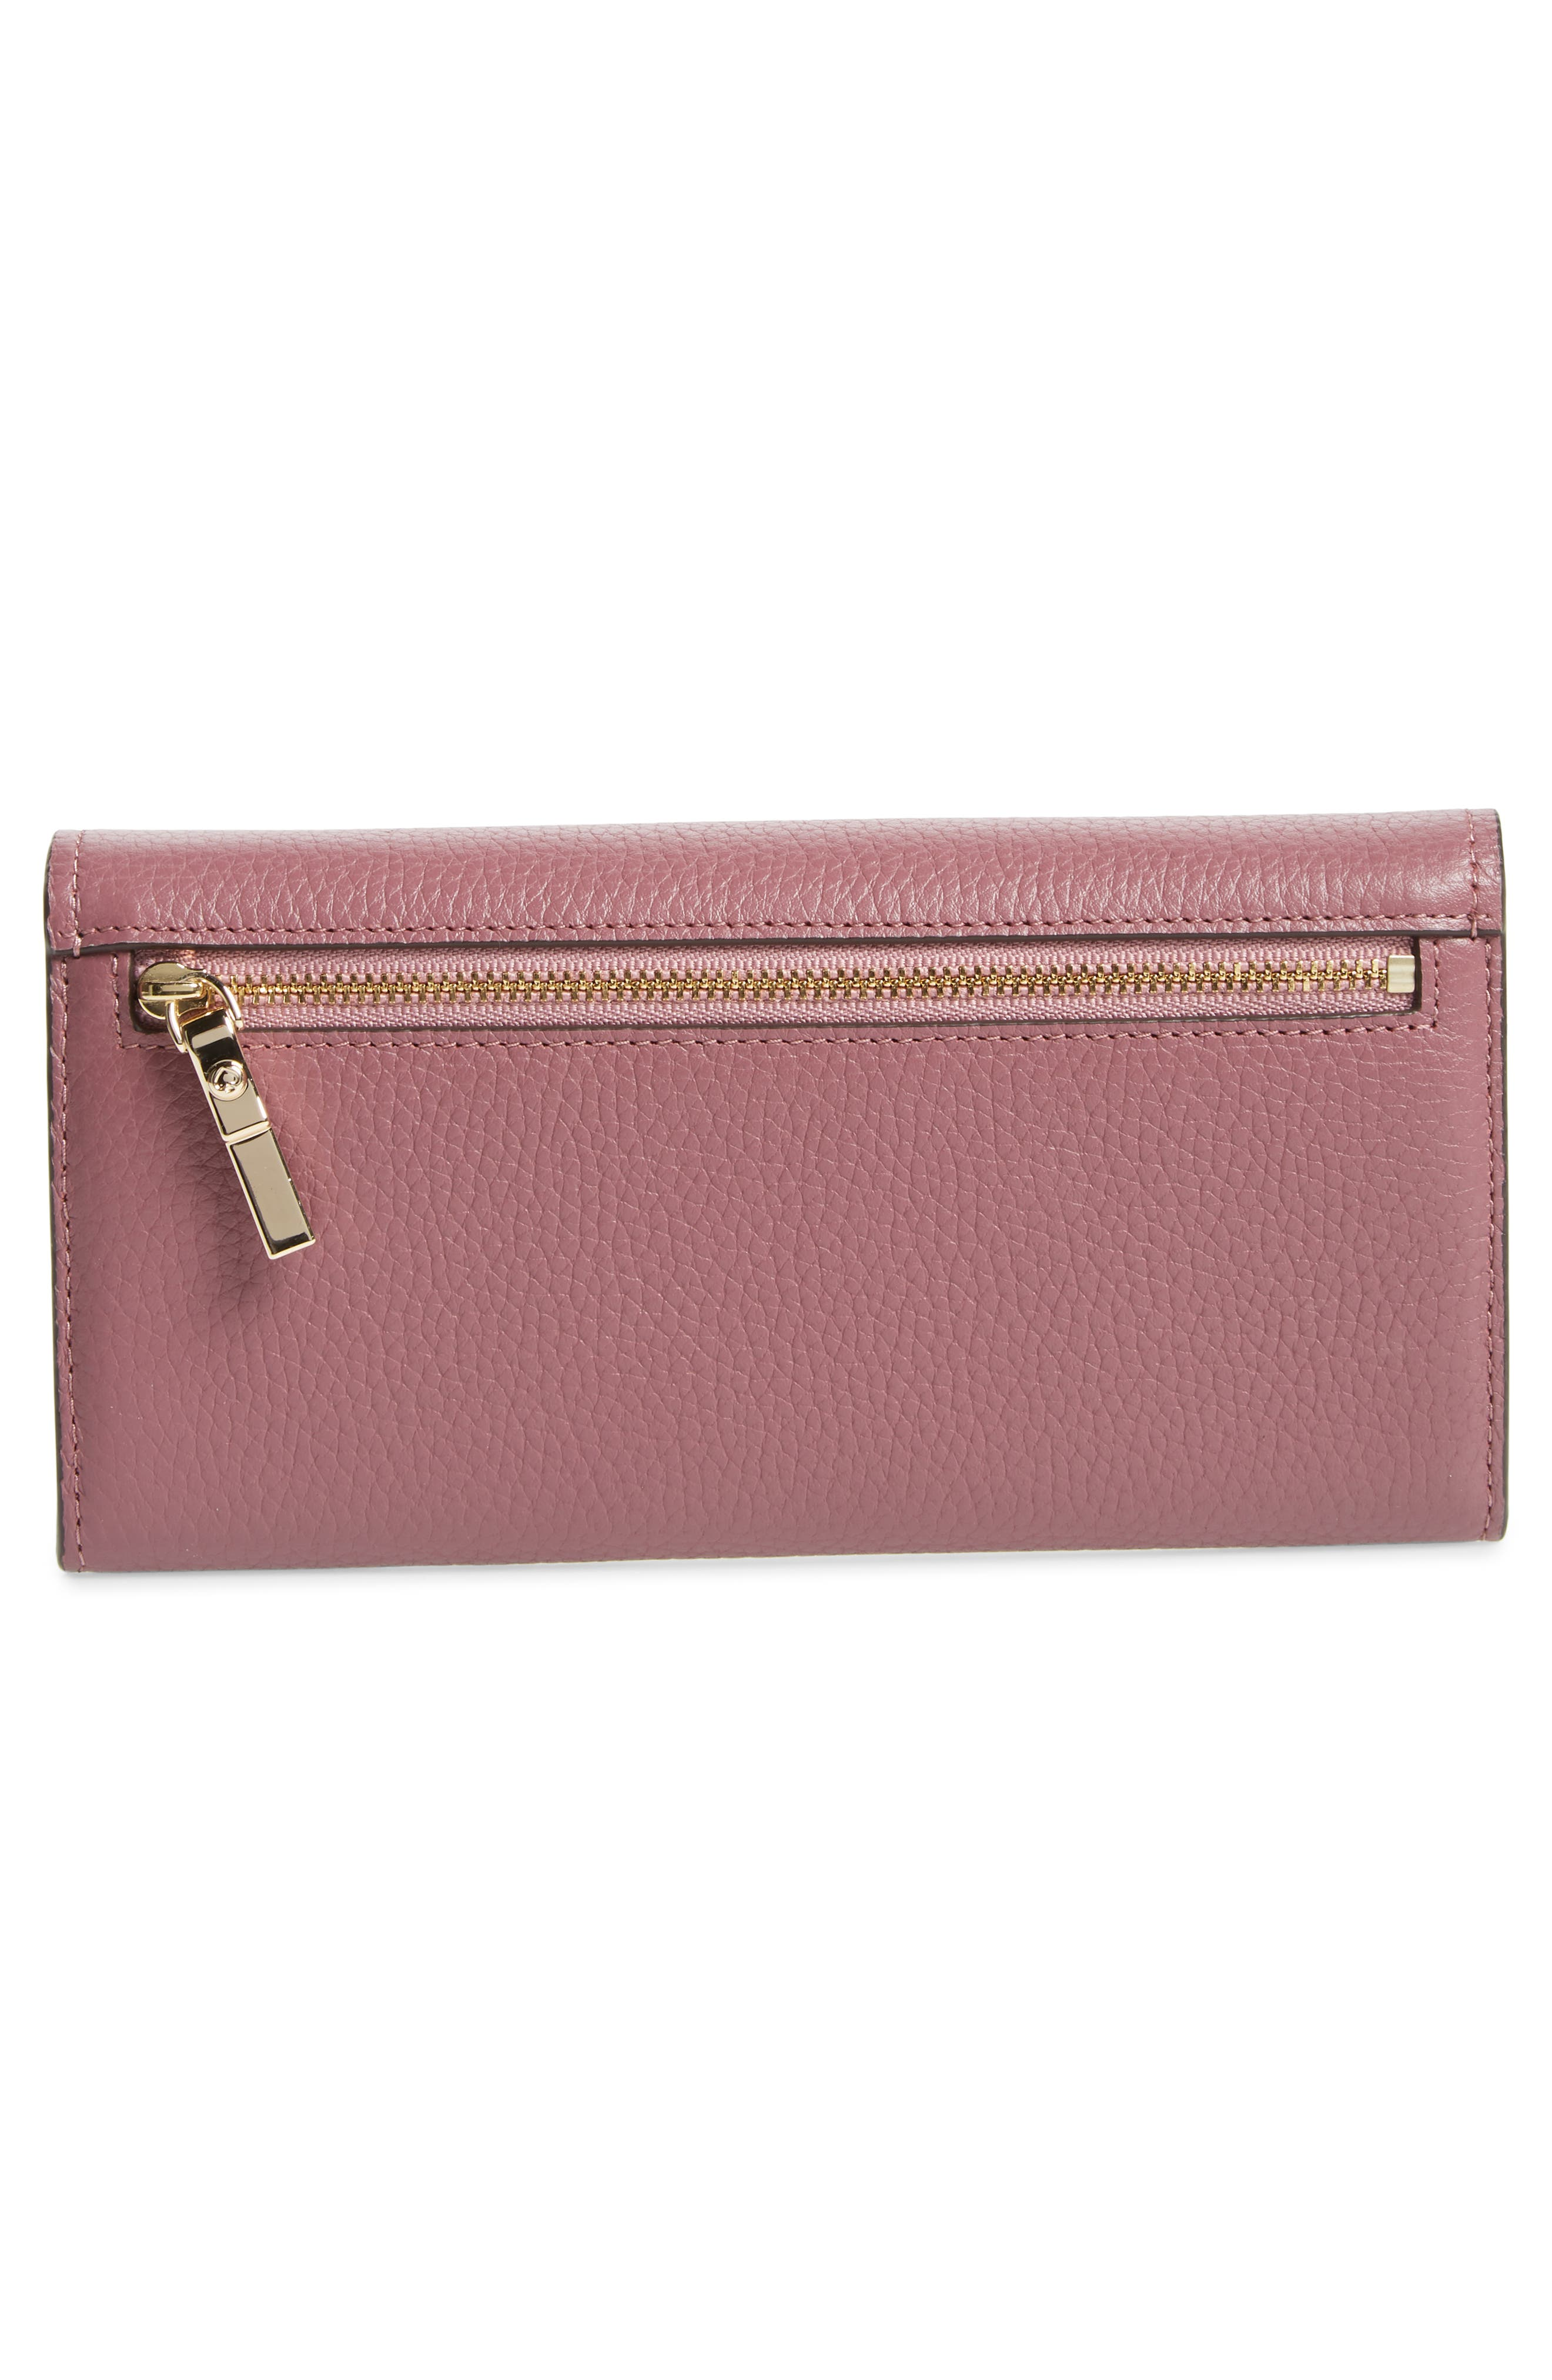 oakwood street – kinsley pebbled leather wallet,                             Alternate thumbnail 3, color,                             564